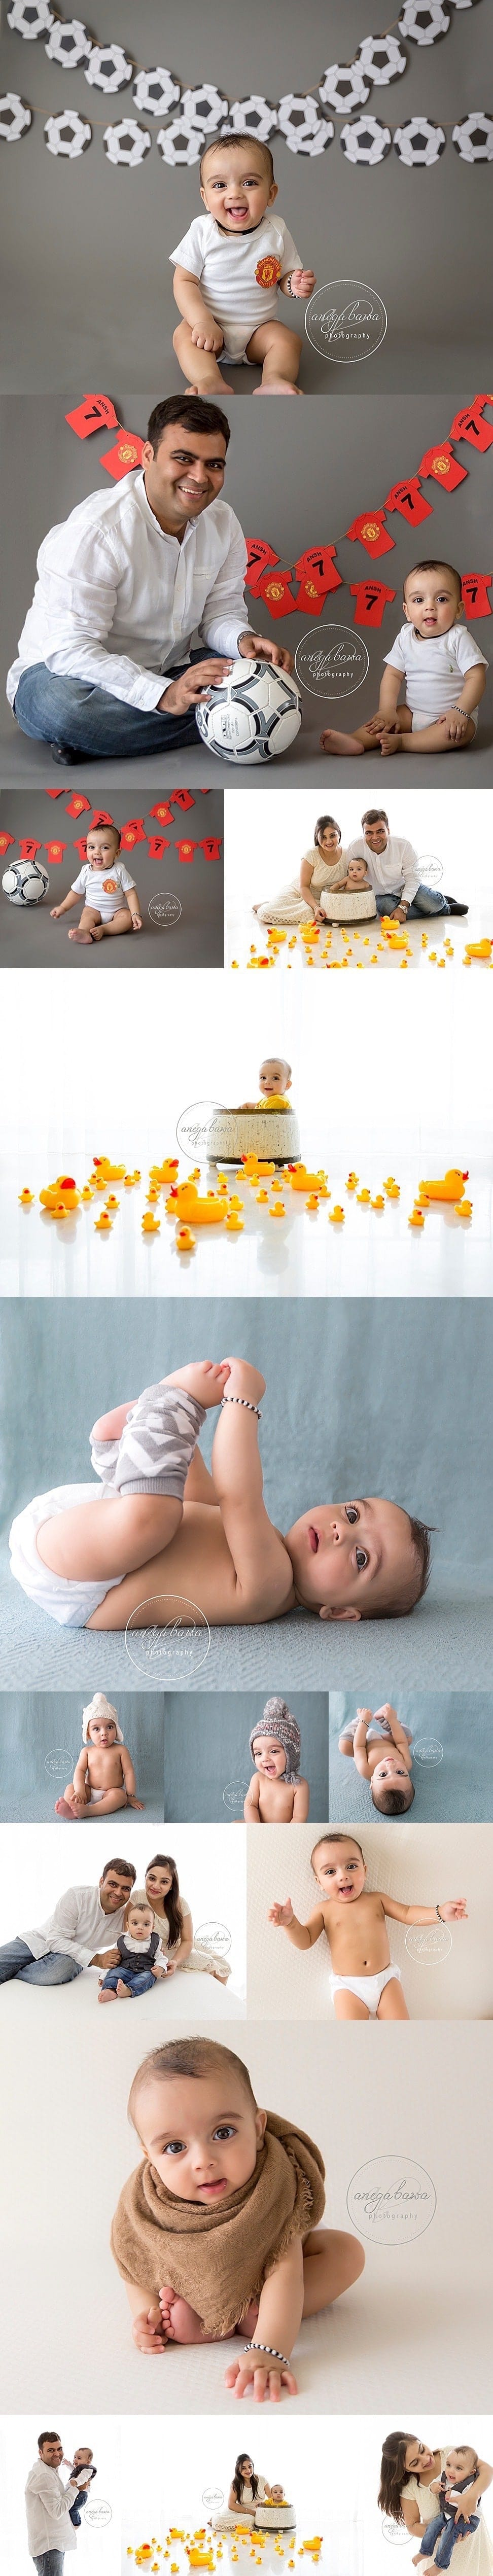 sitter_session_7_months_boy_baby_child